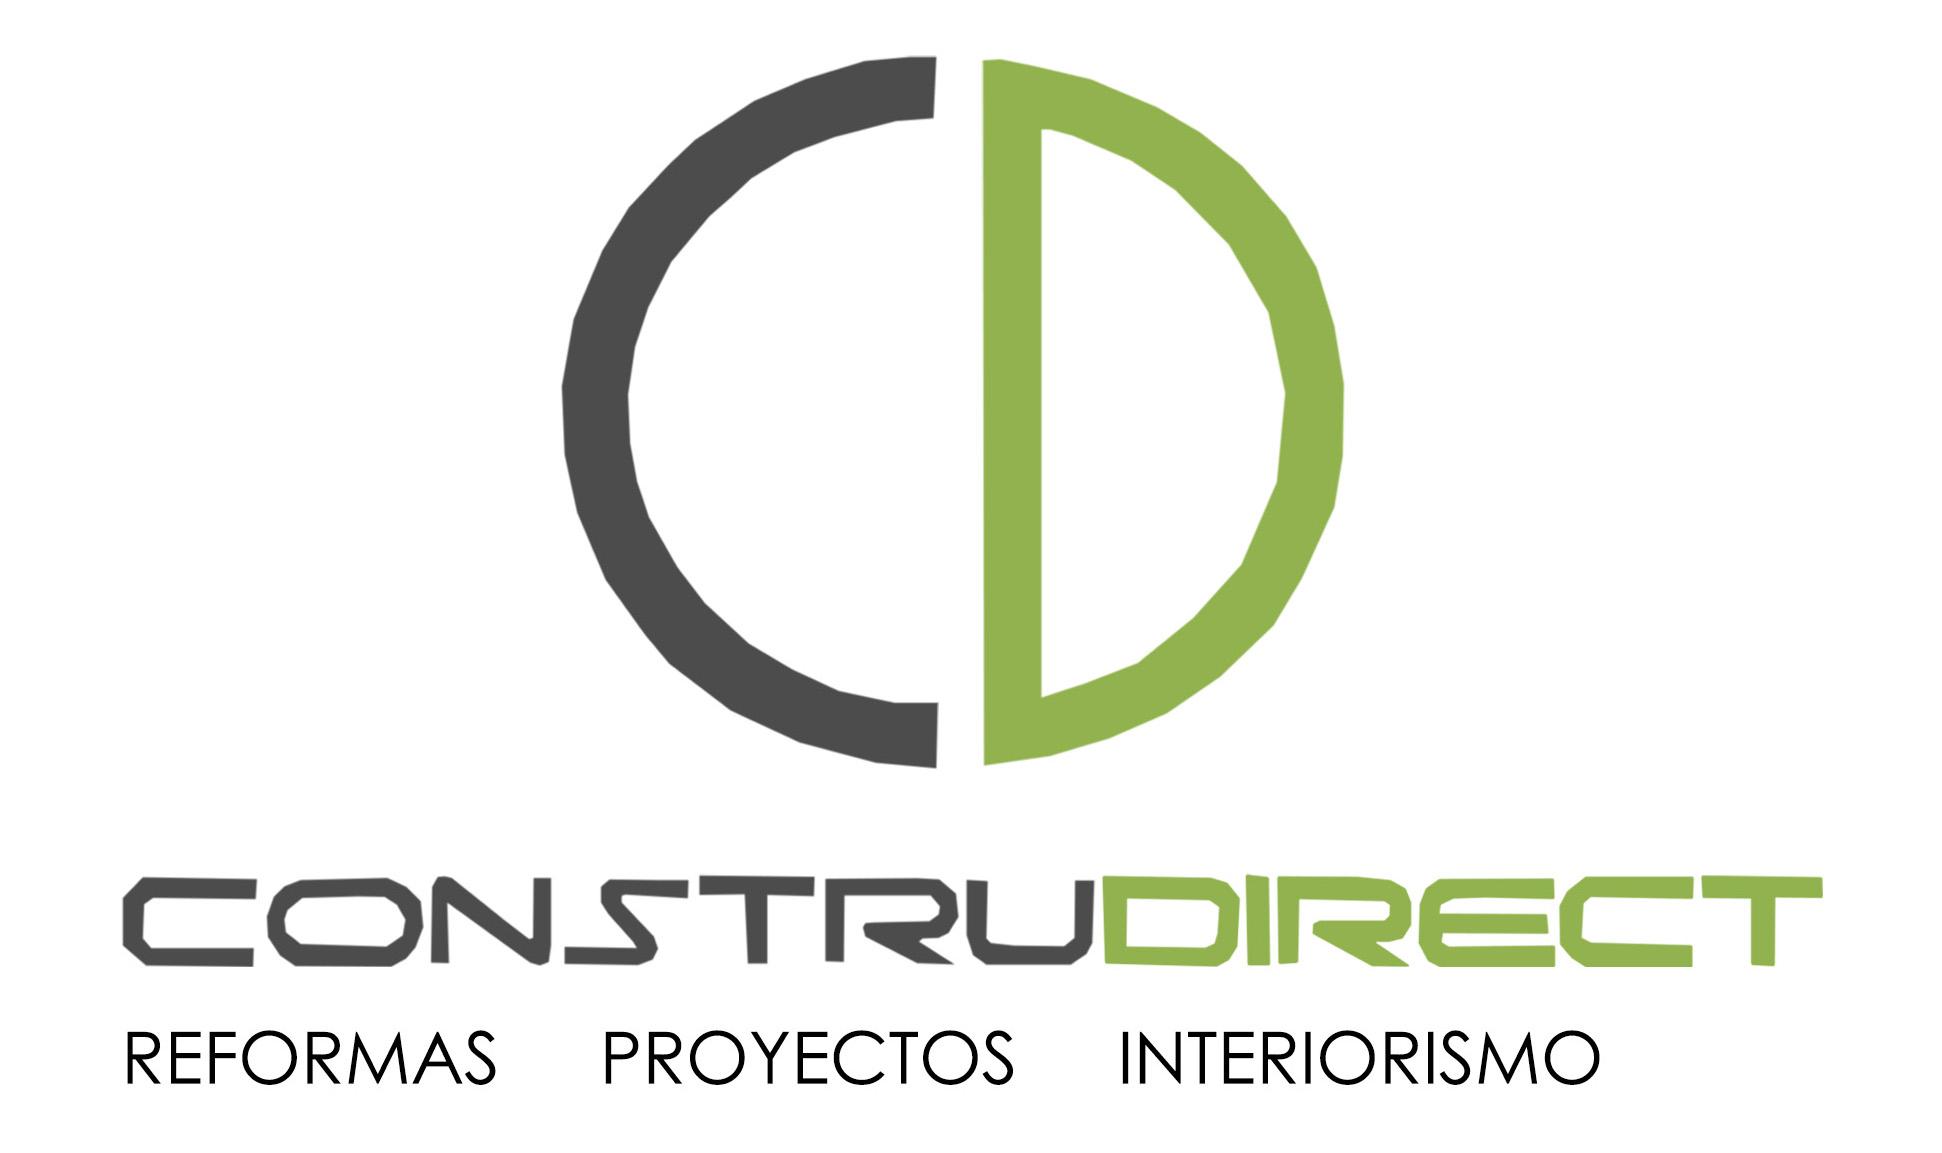 Construdirect